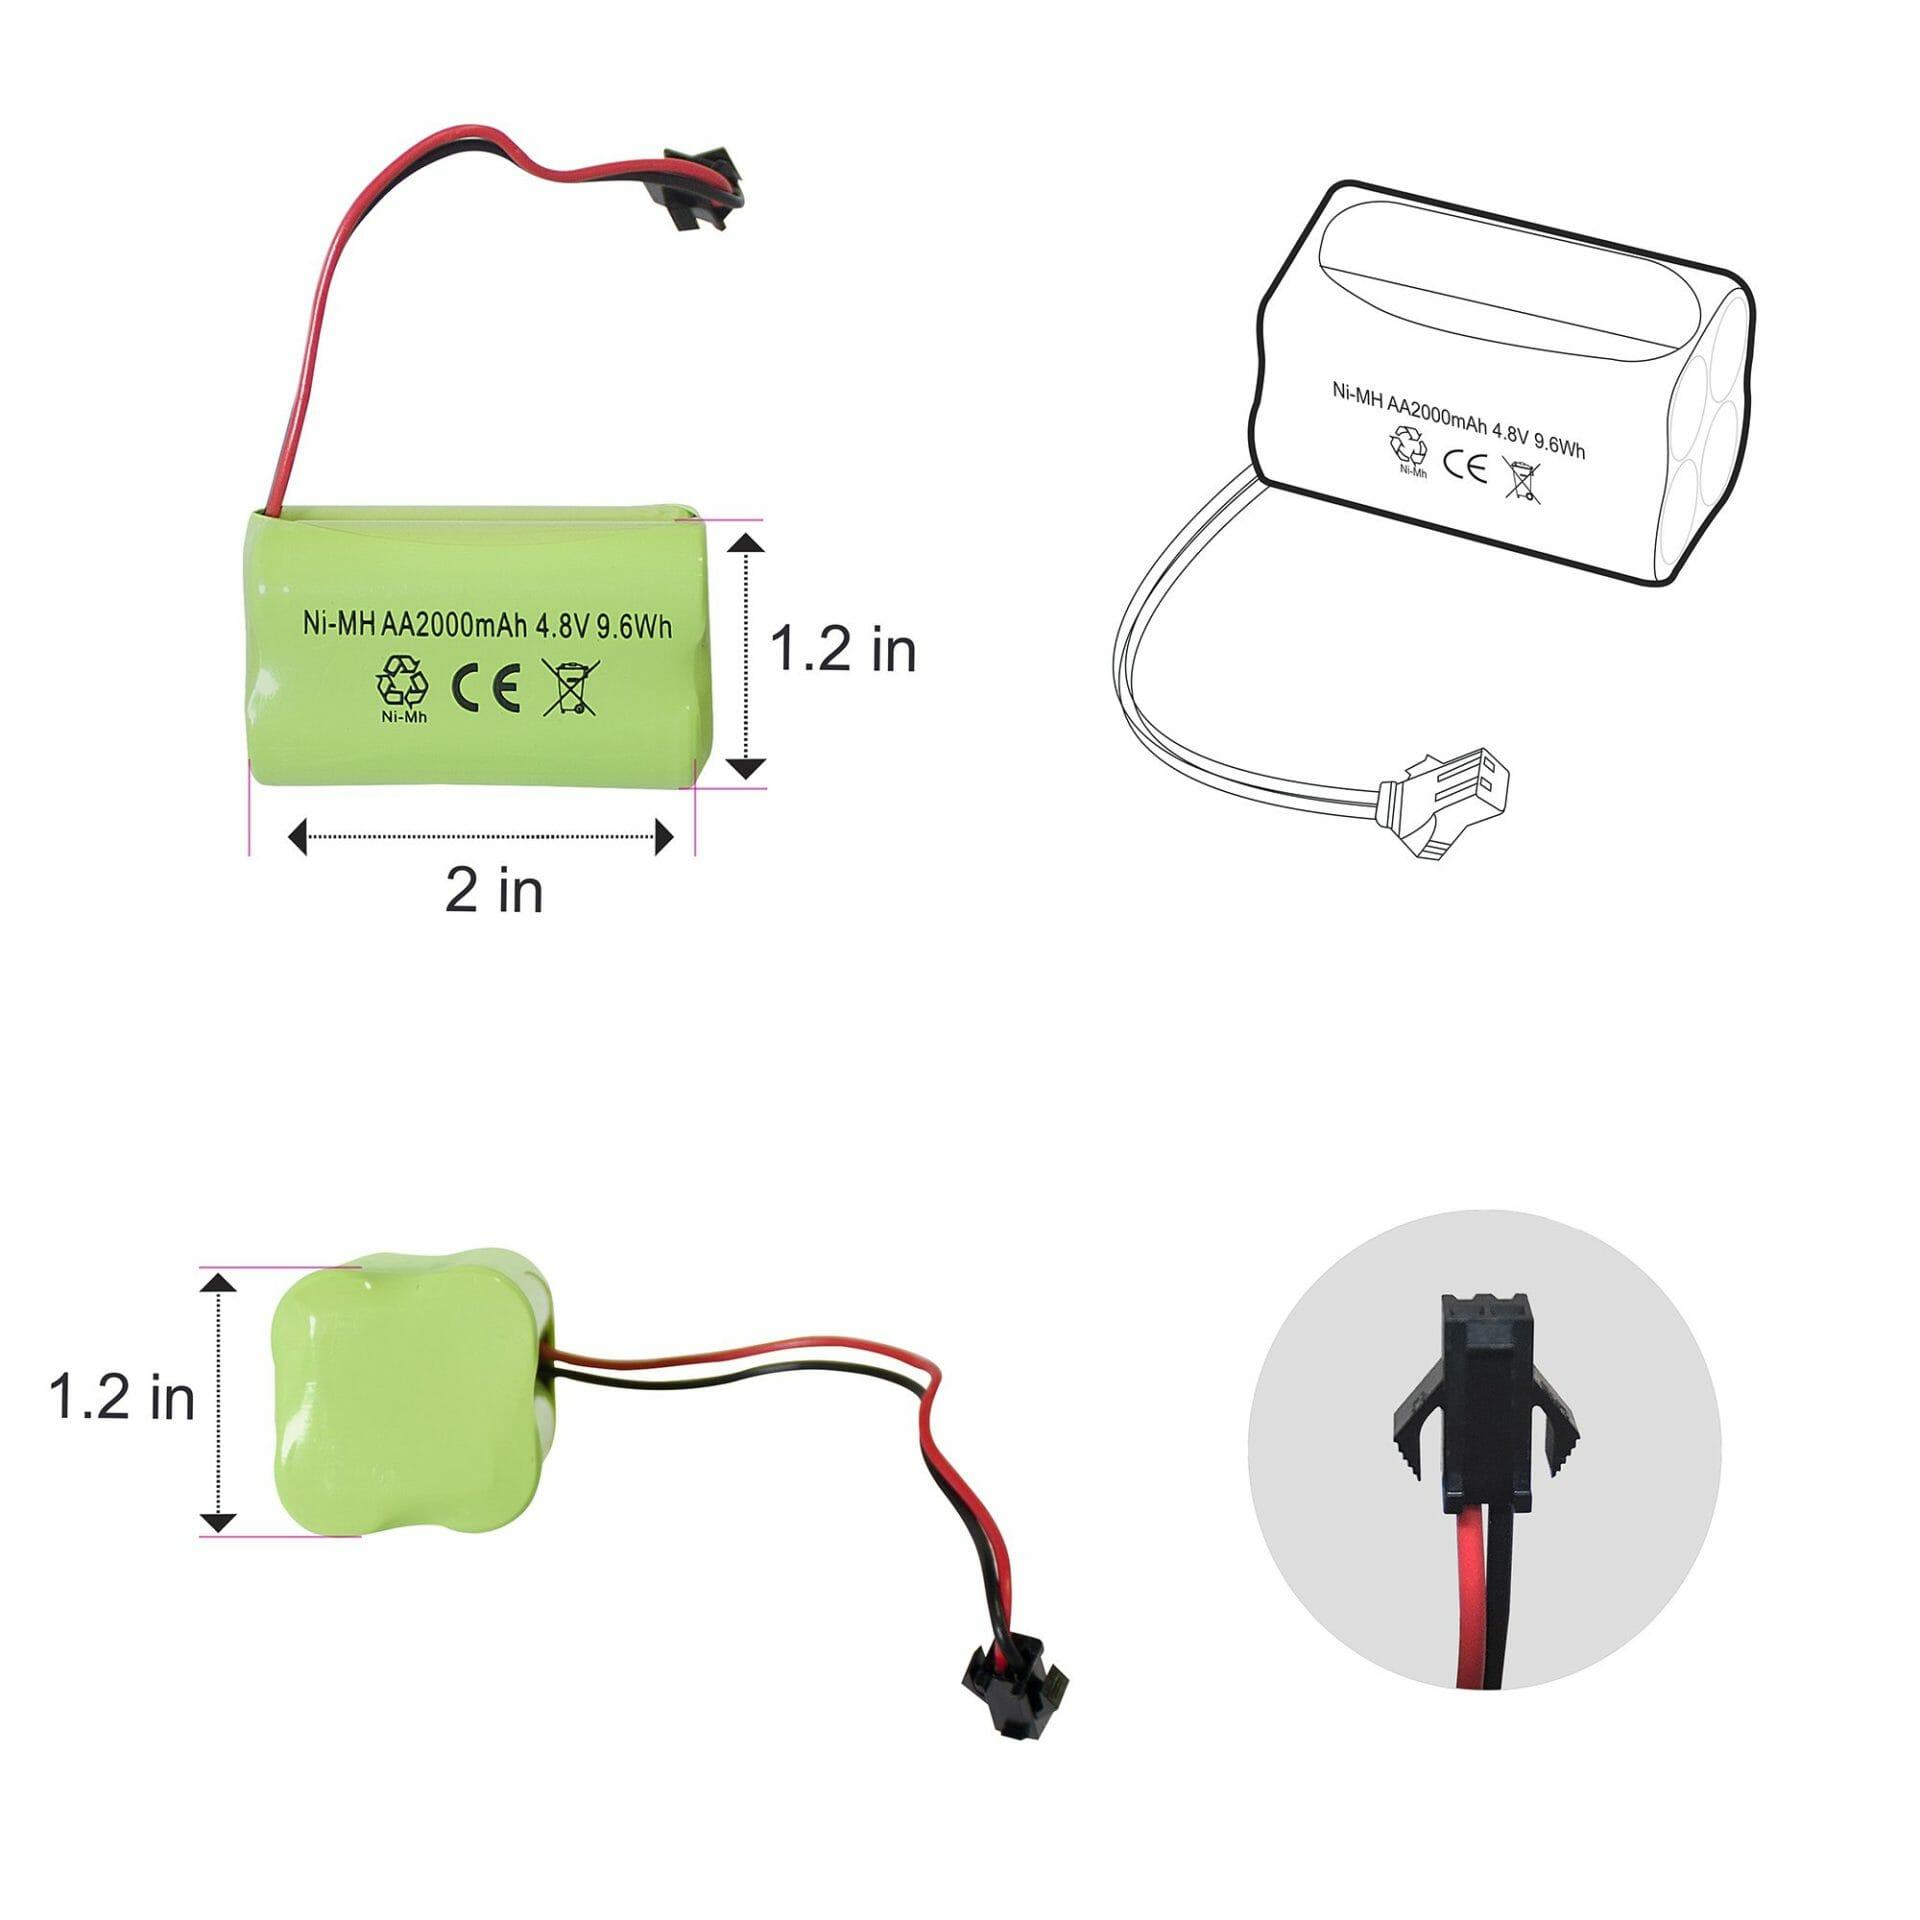 4.8V Battery Dimensions